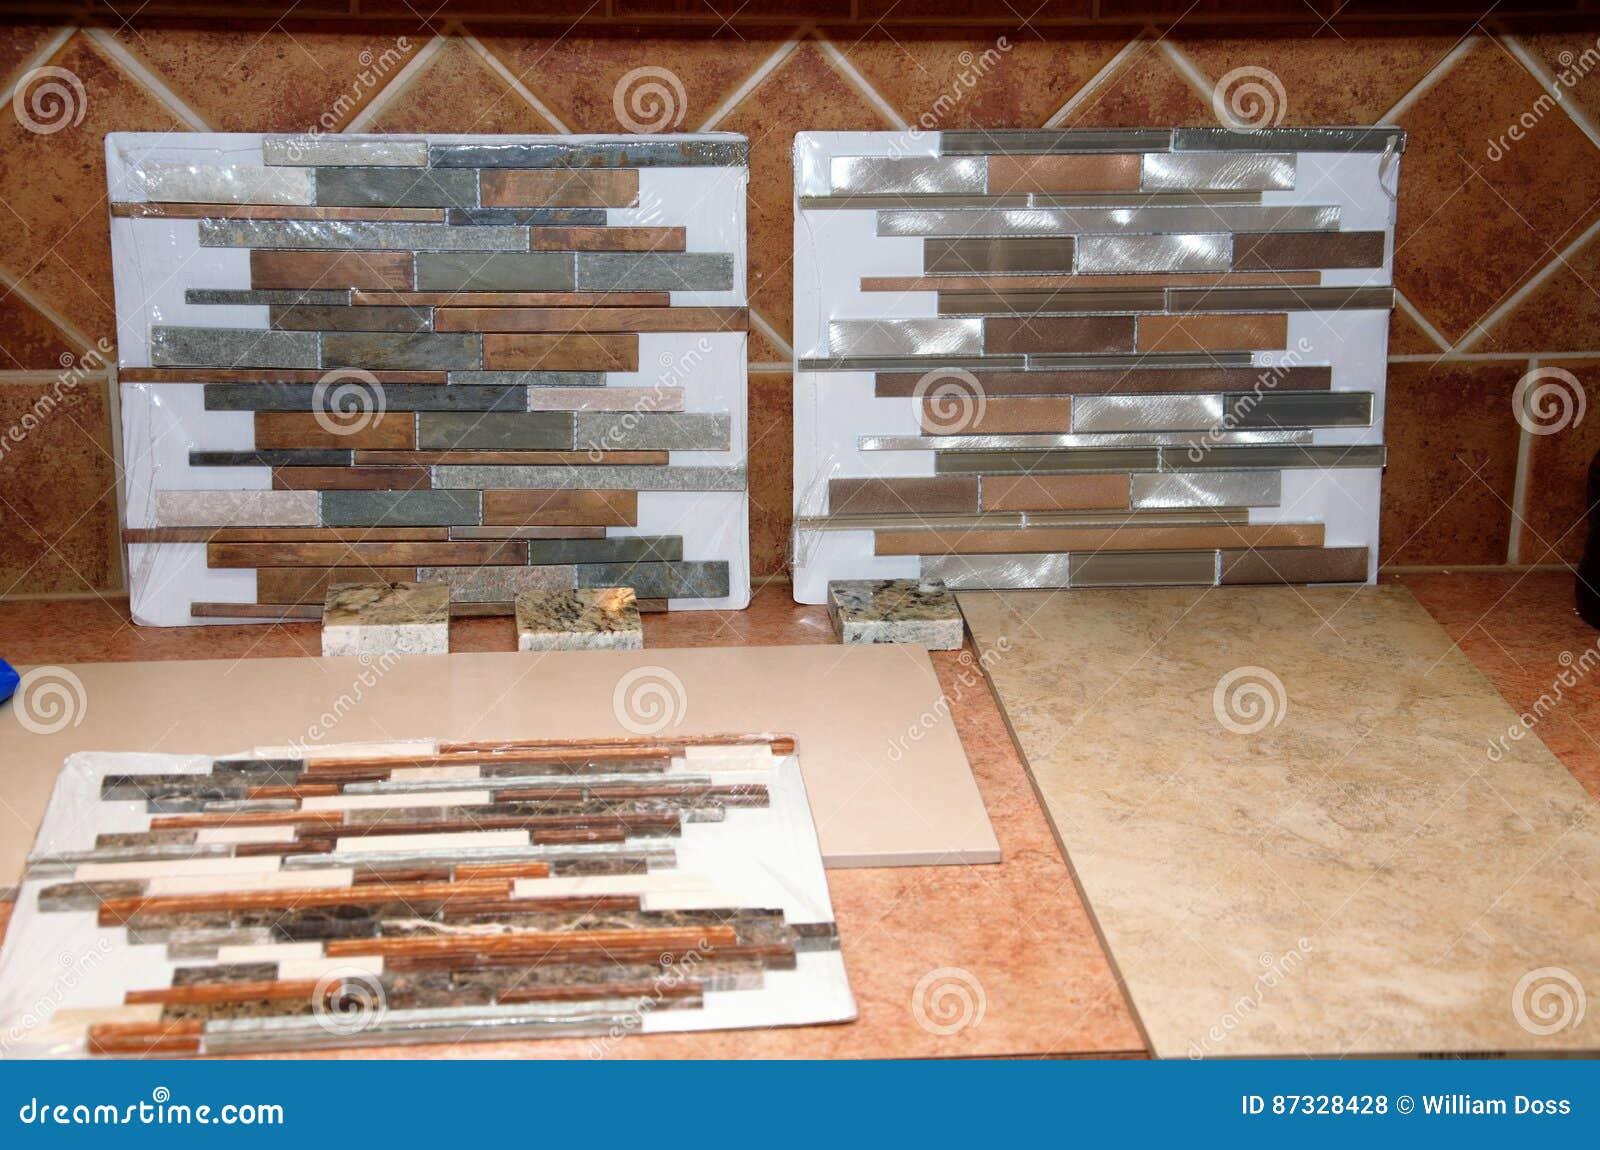 Kitchen Tile Samples tile samples stock photo - image: 87328428